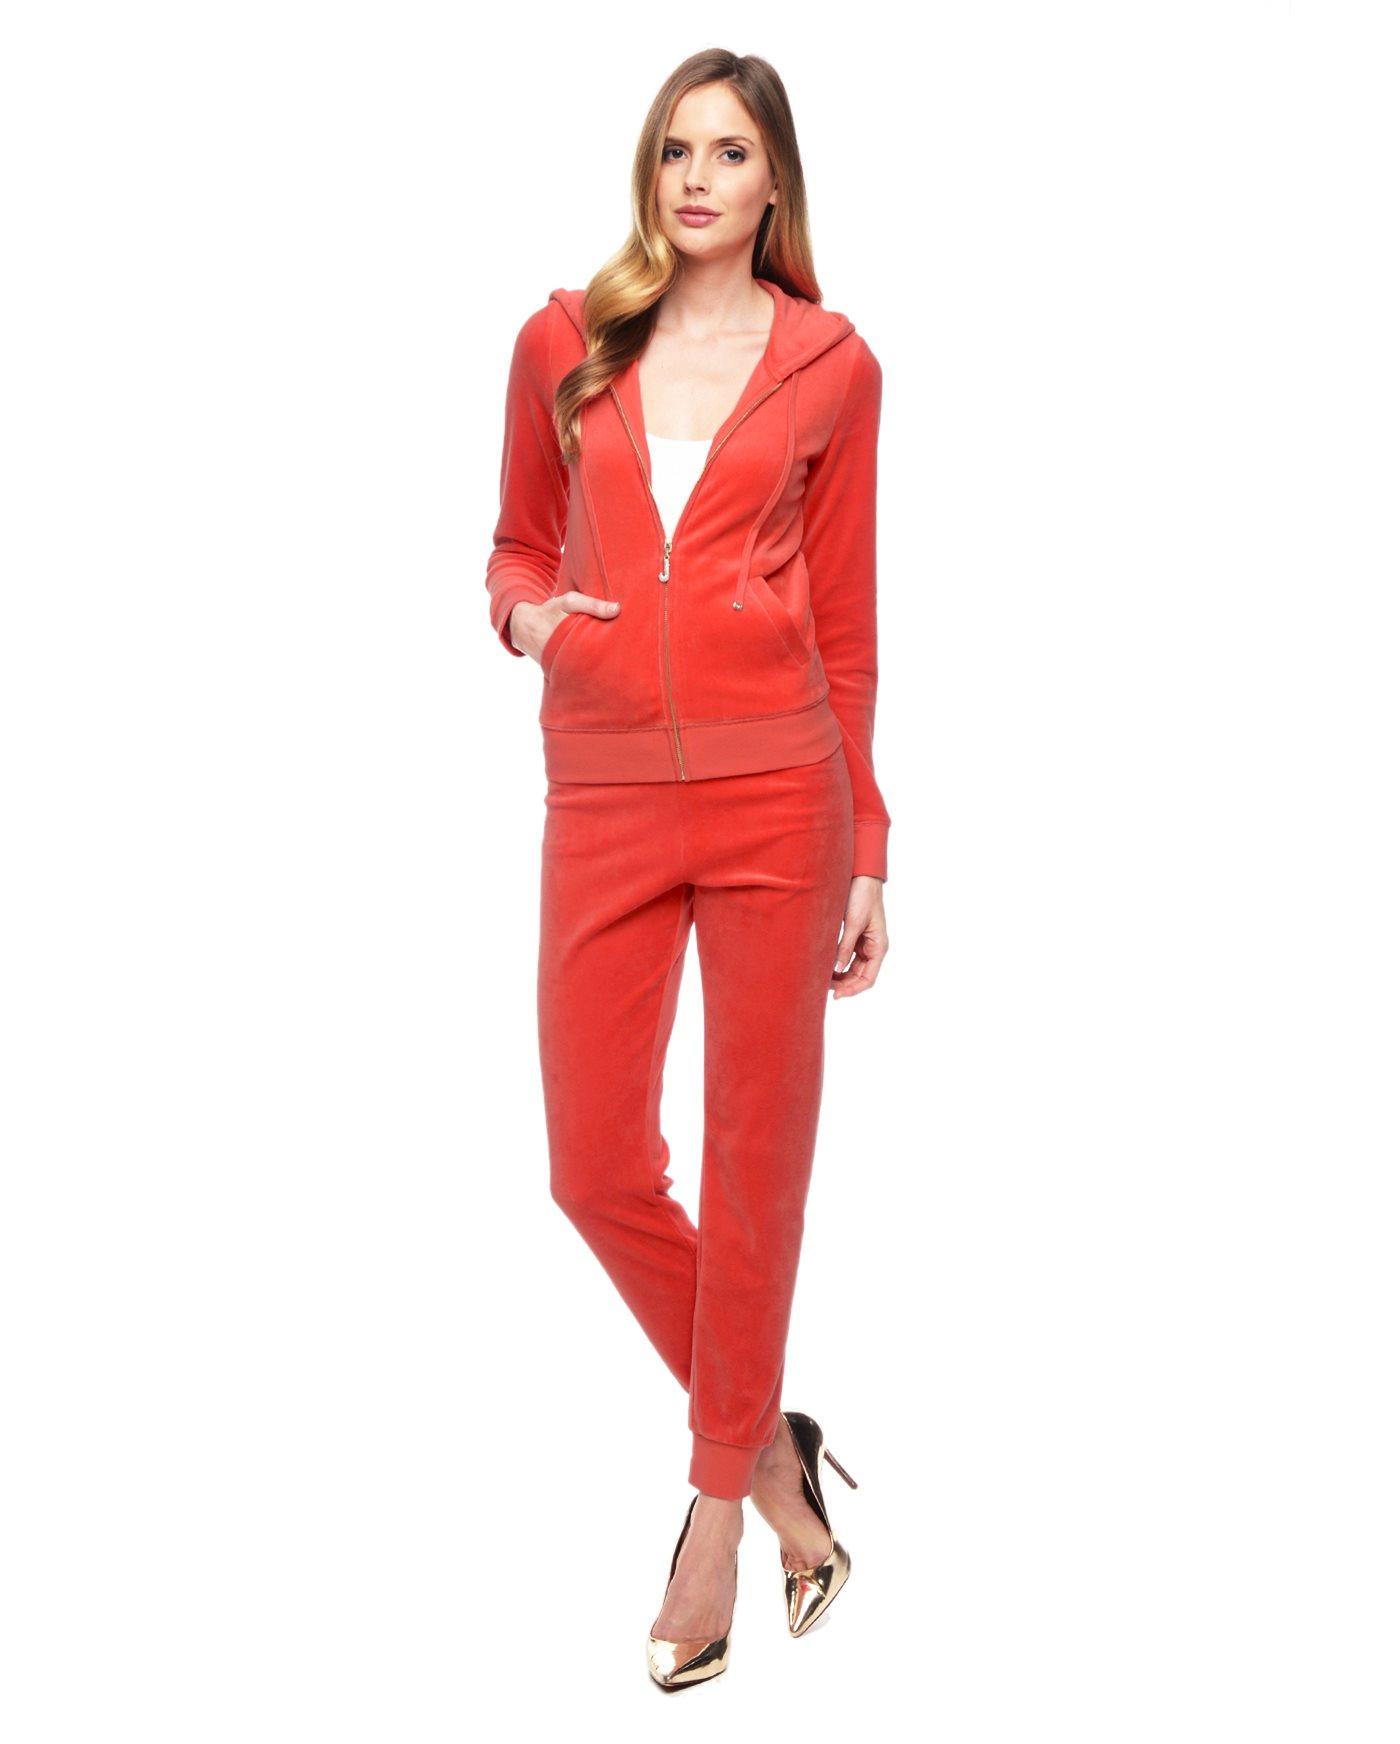 Juicy couture J Bling Original Velour Jacket in Orange | Lyst